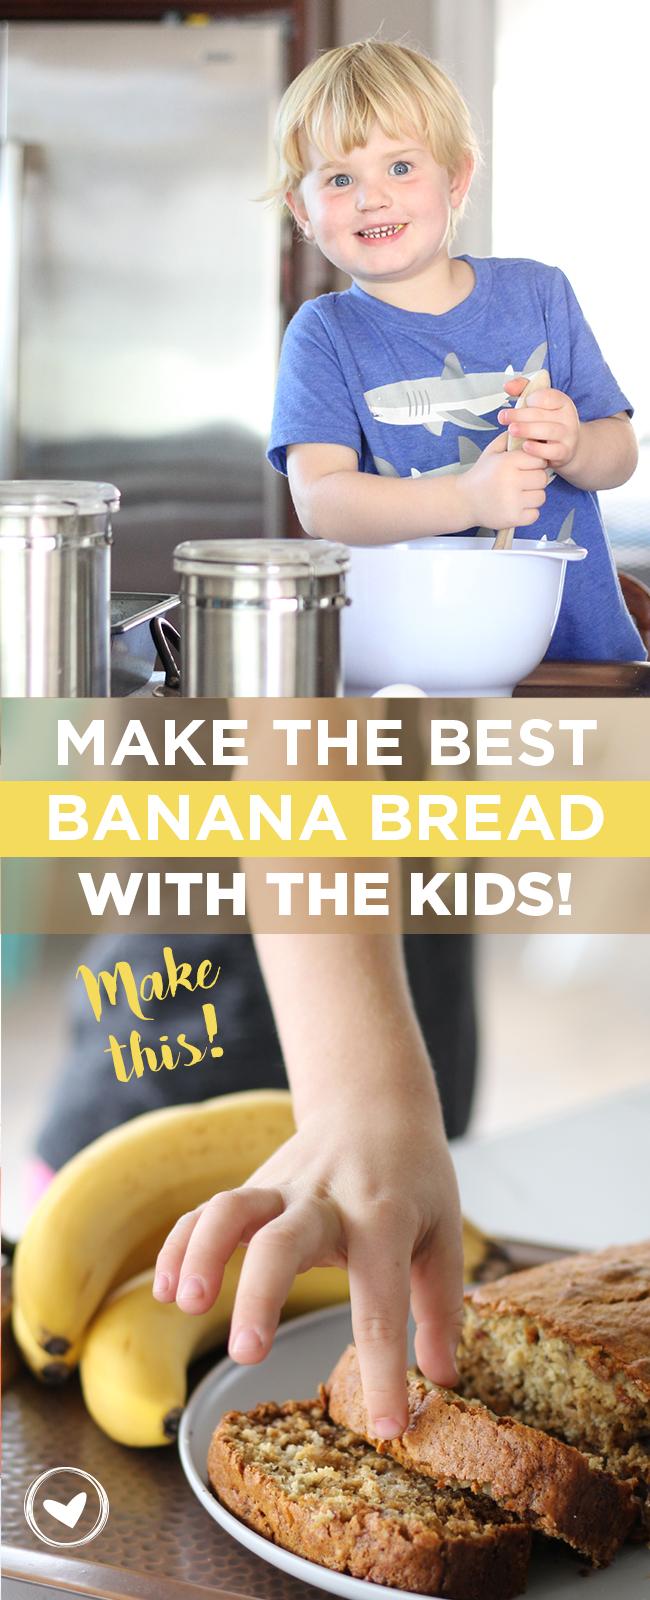 make the best banana bread